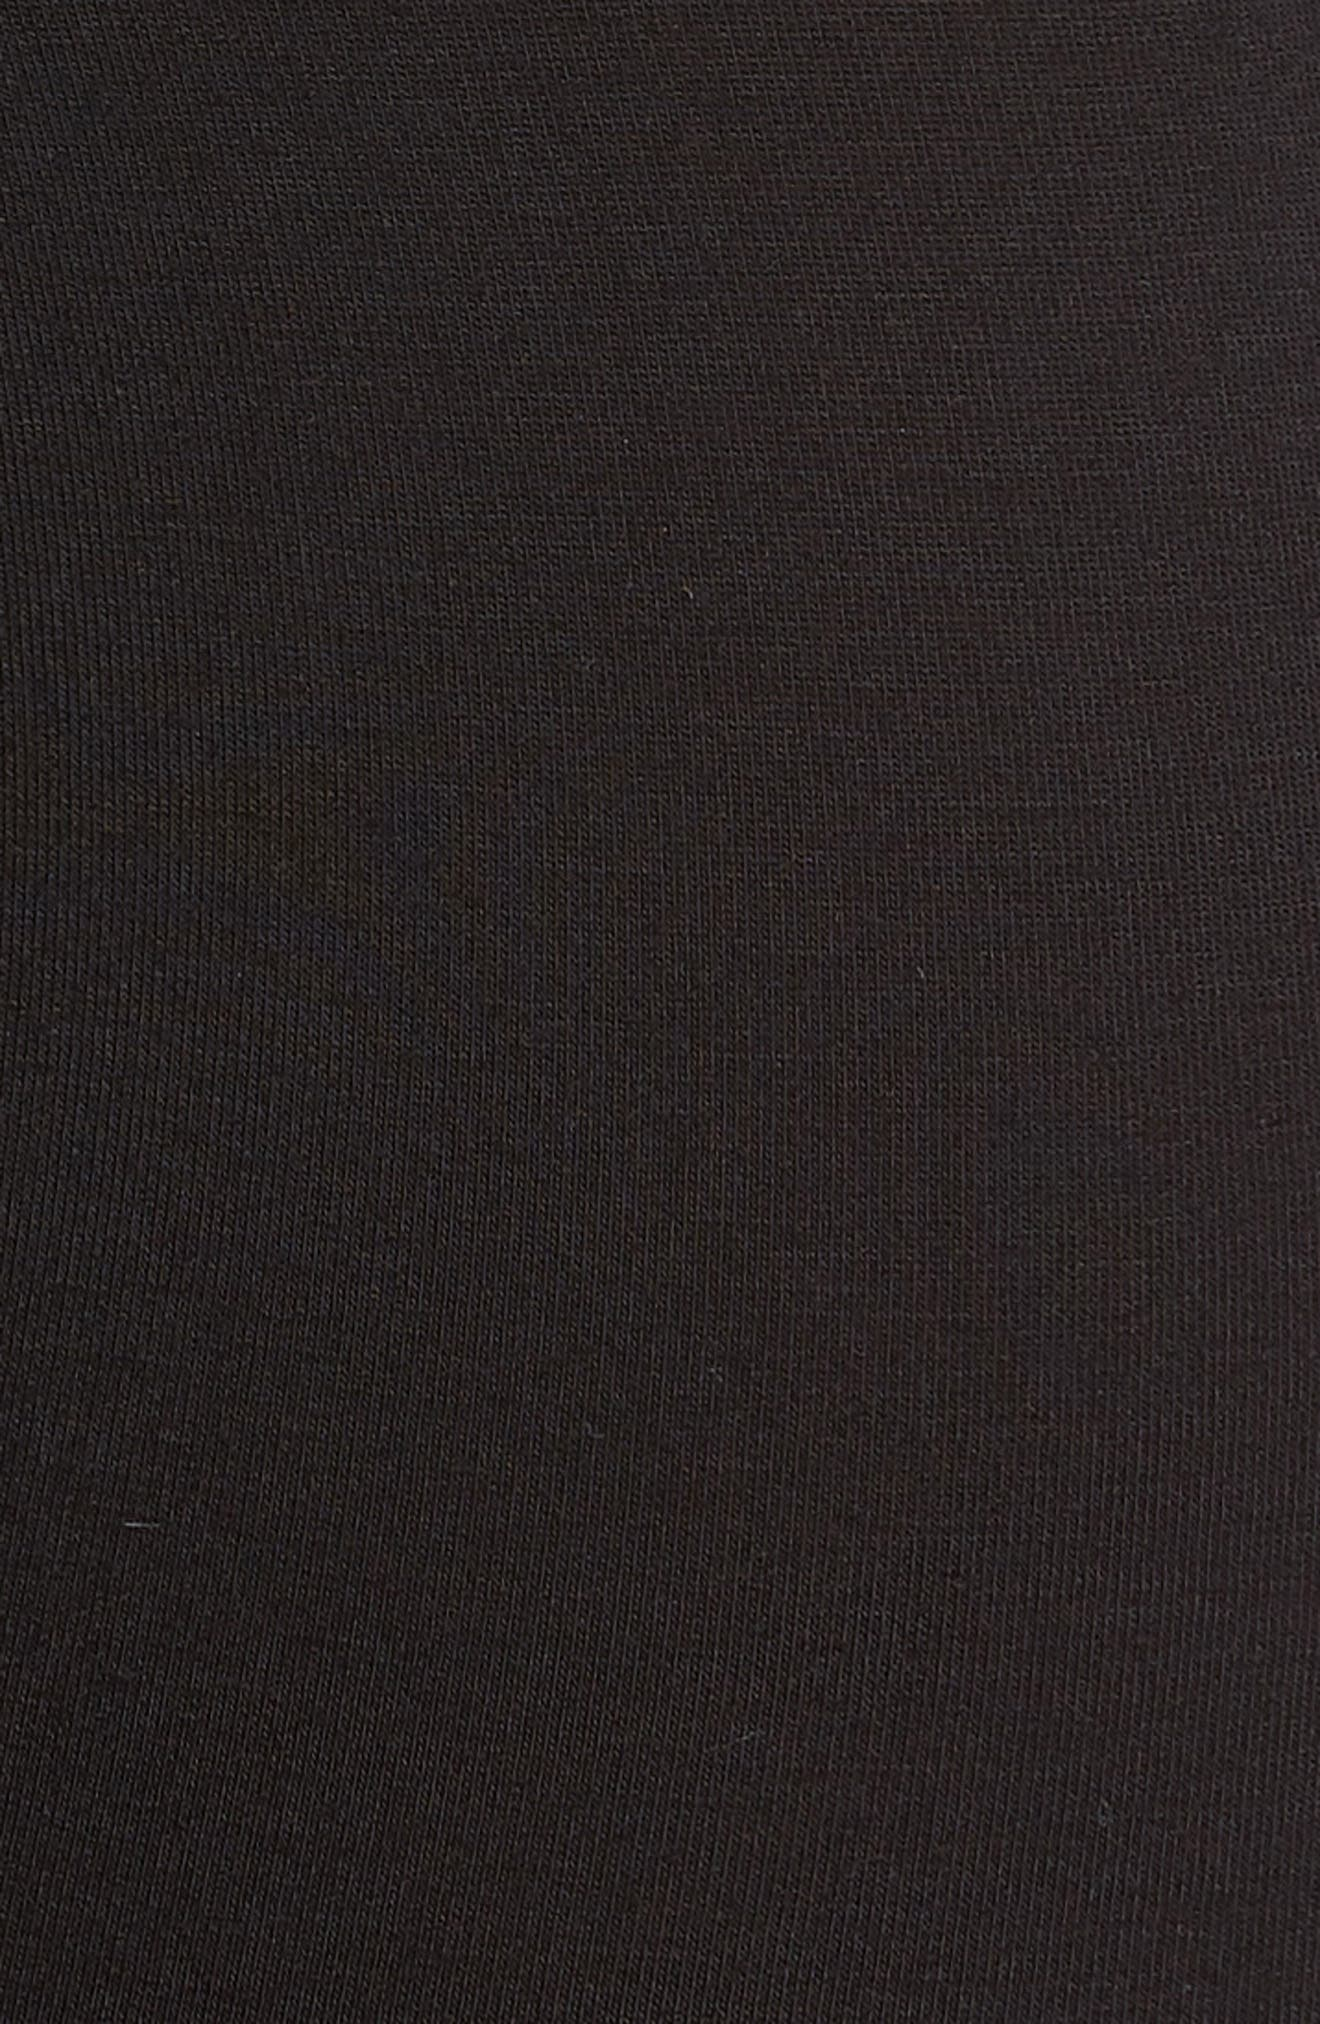 Vibe Boxer Briefs,                             Alternate thumbnail 5, color,                             Black